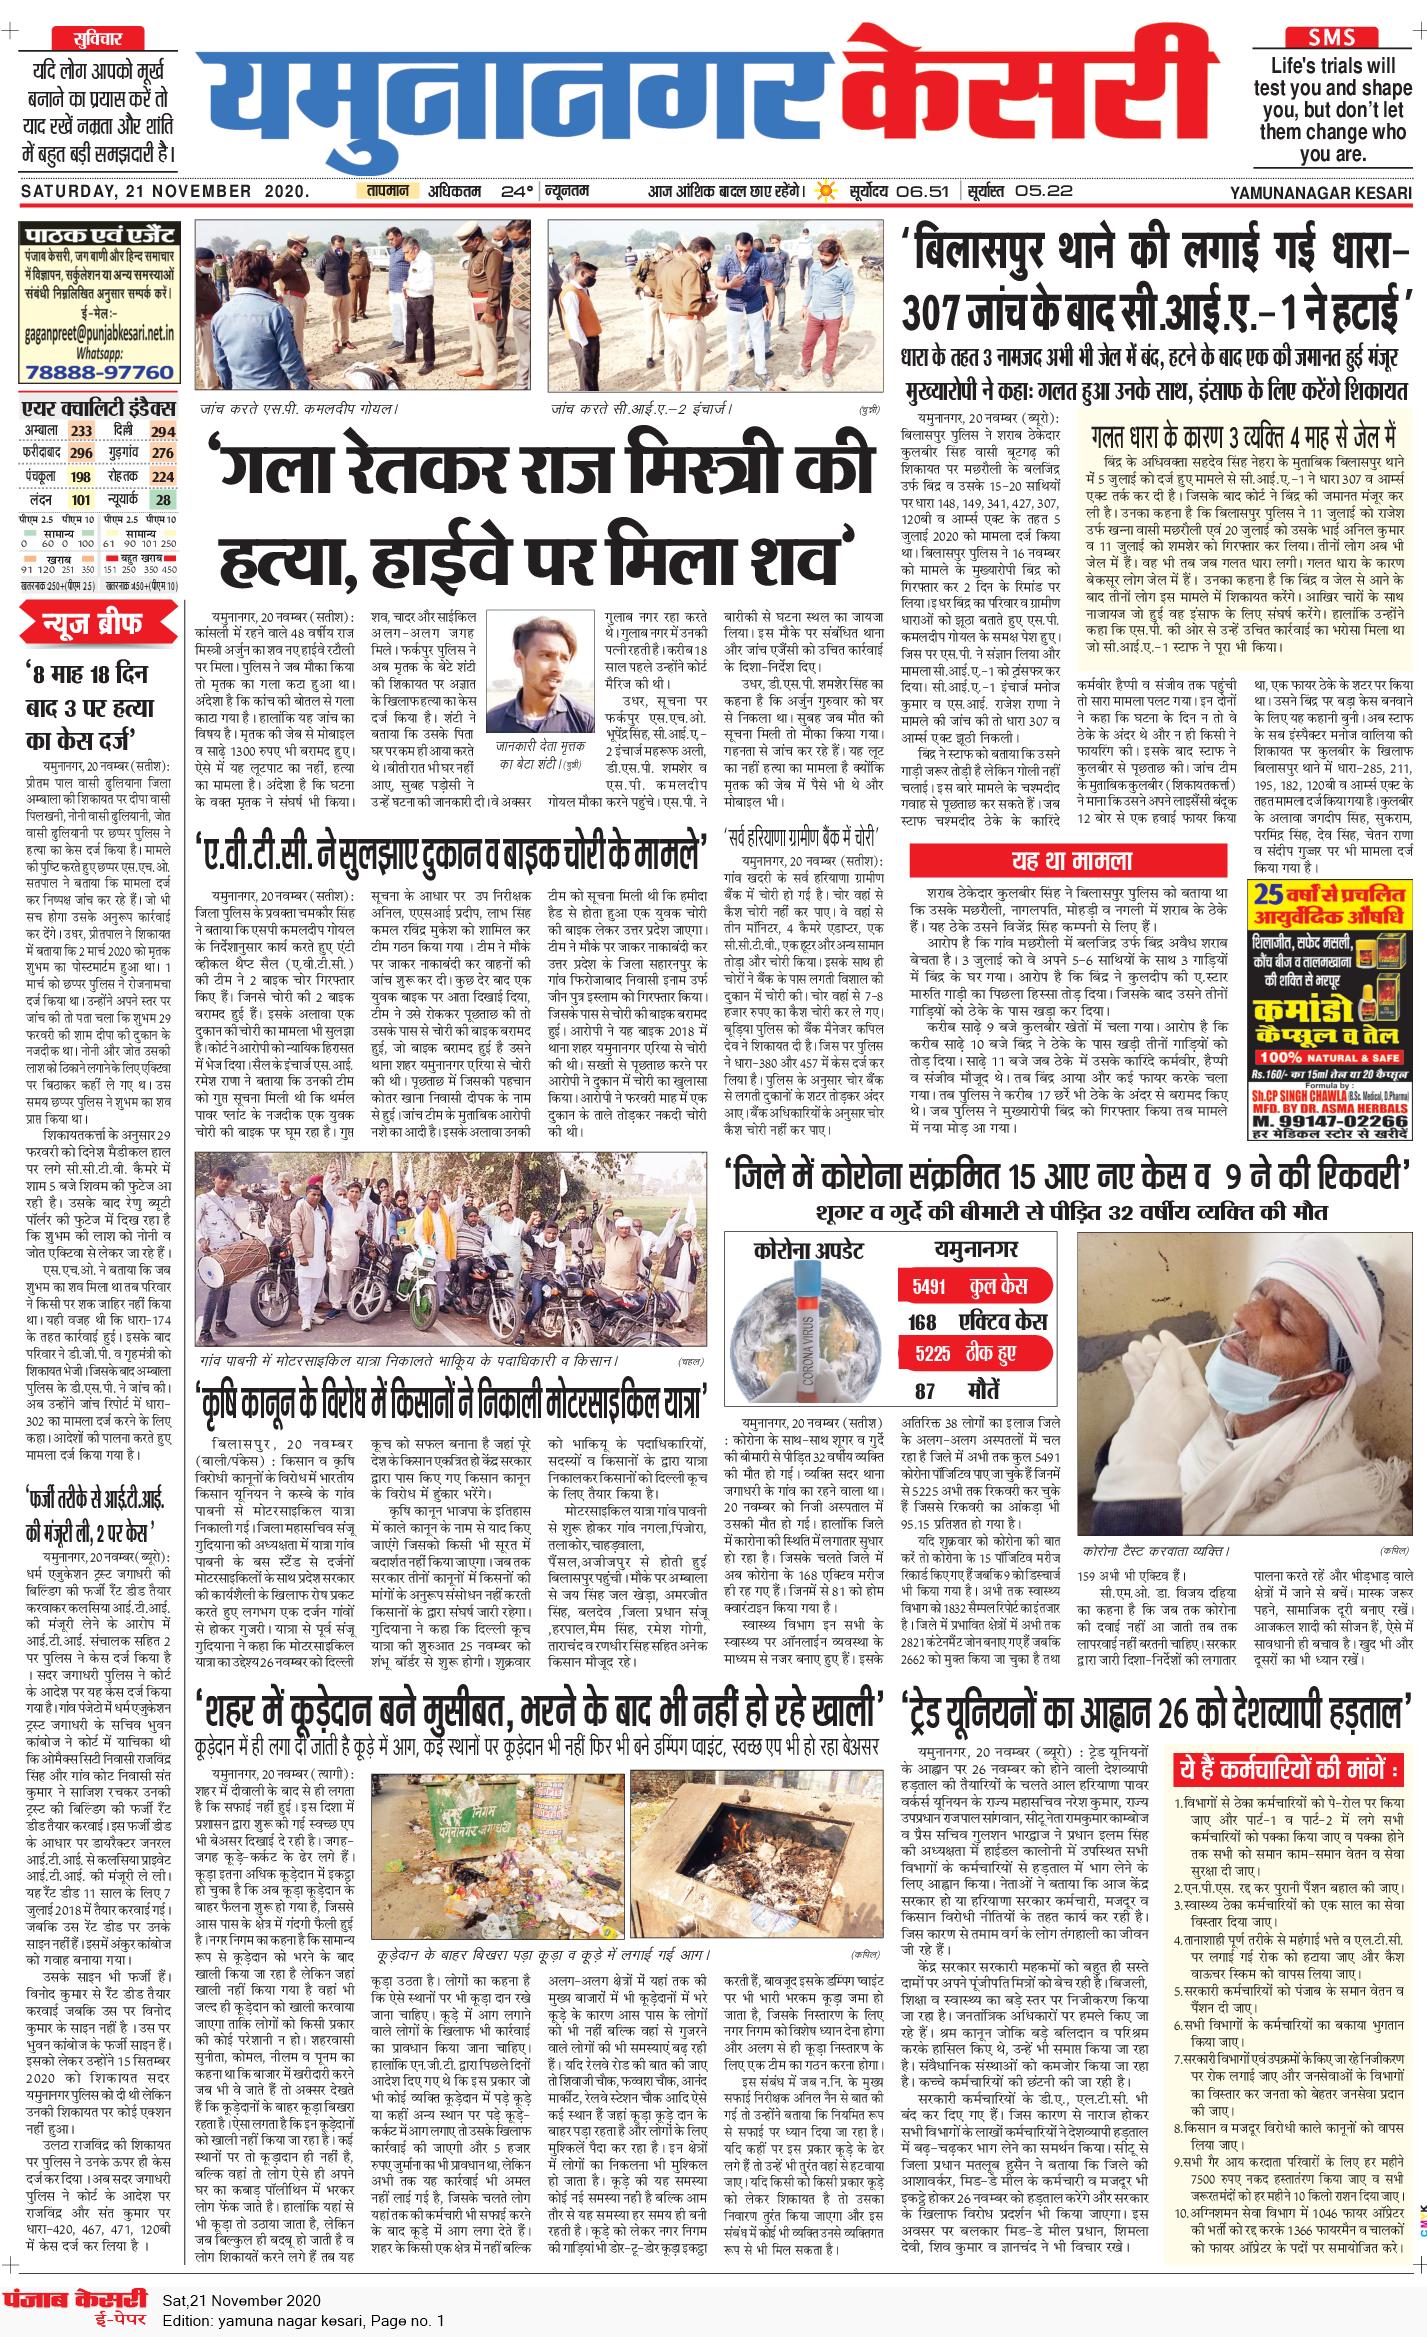 Yamuna Nagar Kesari 11/21/2020 12:00:00 AM